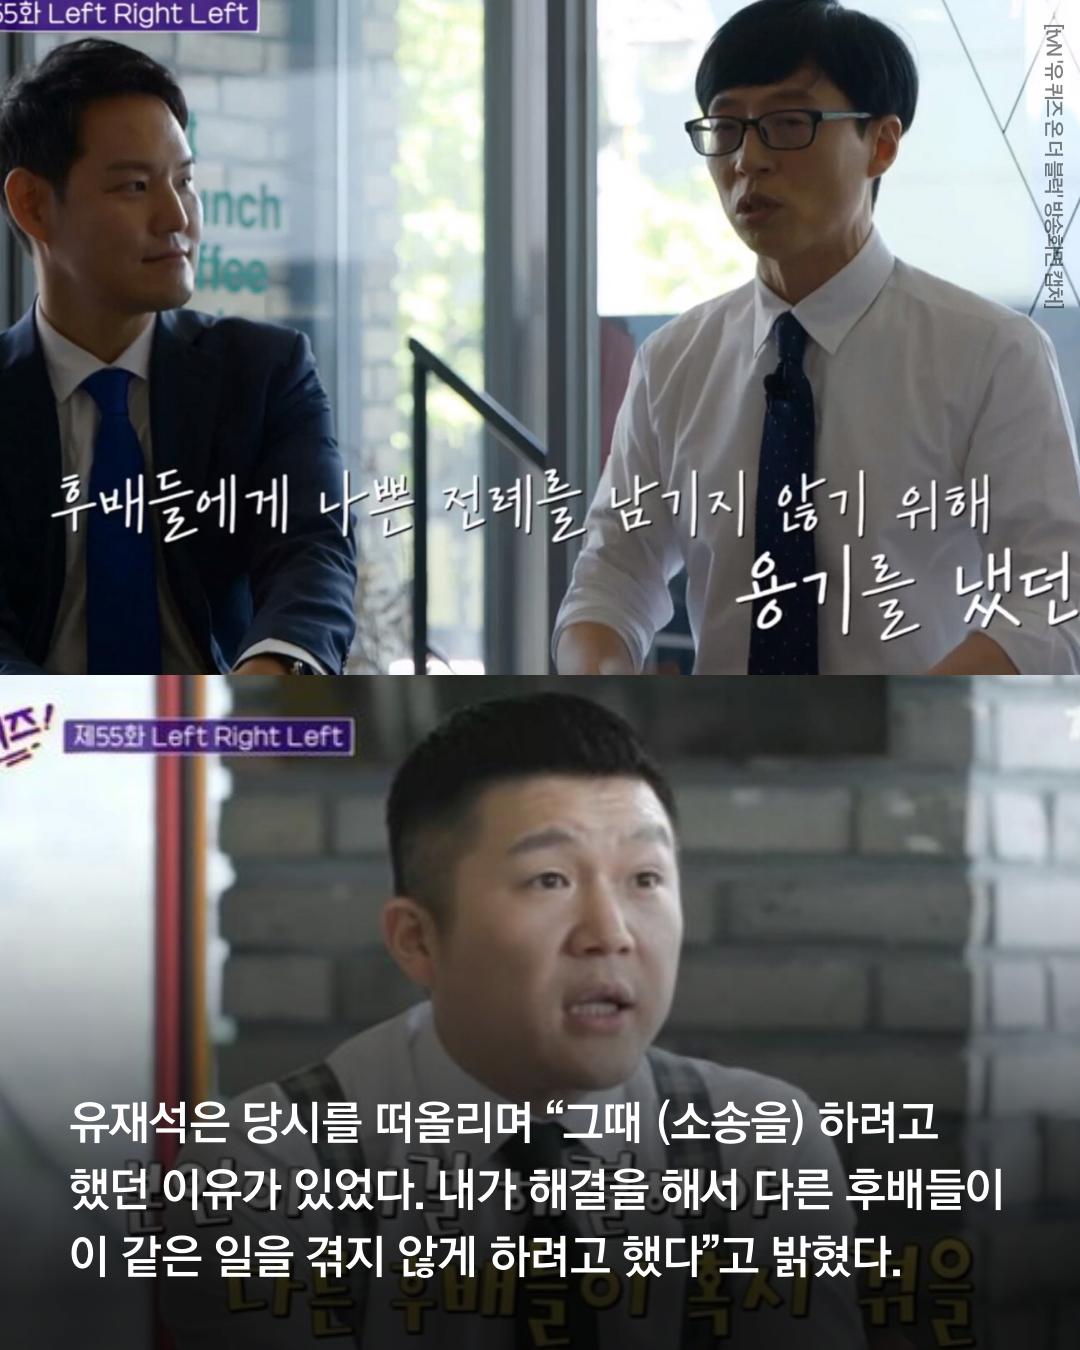 8.png 유재석이 10년간 끈질기게 소송을 한 이유..